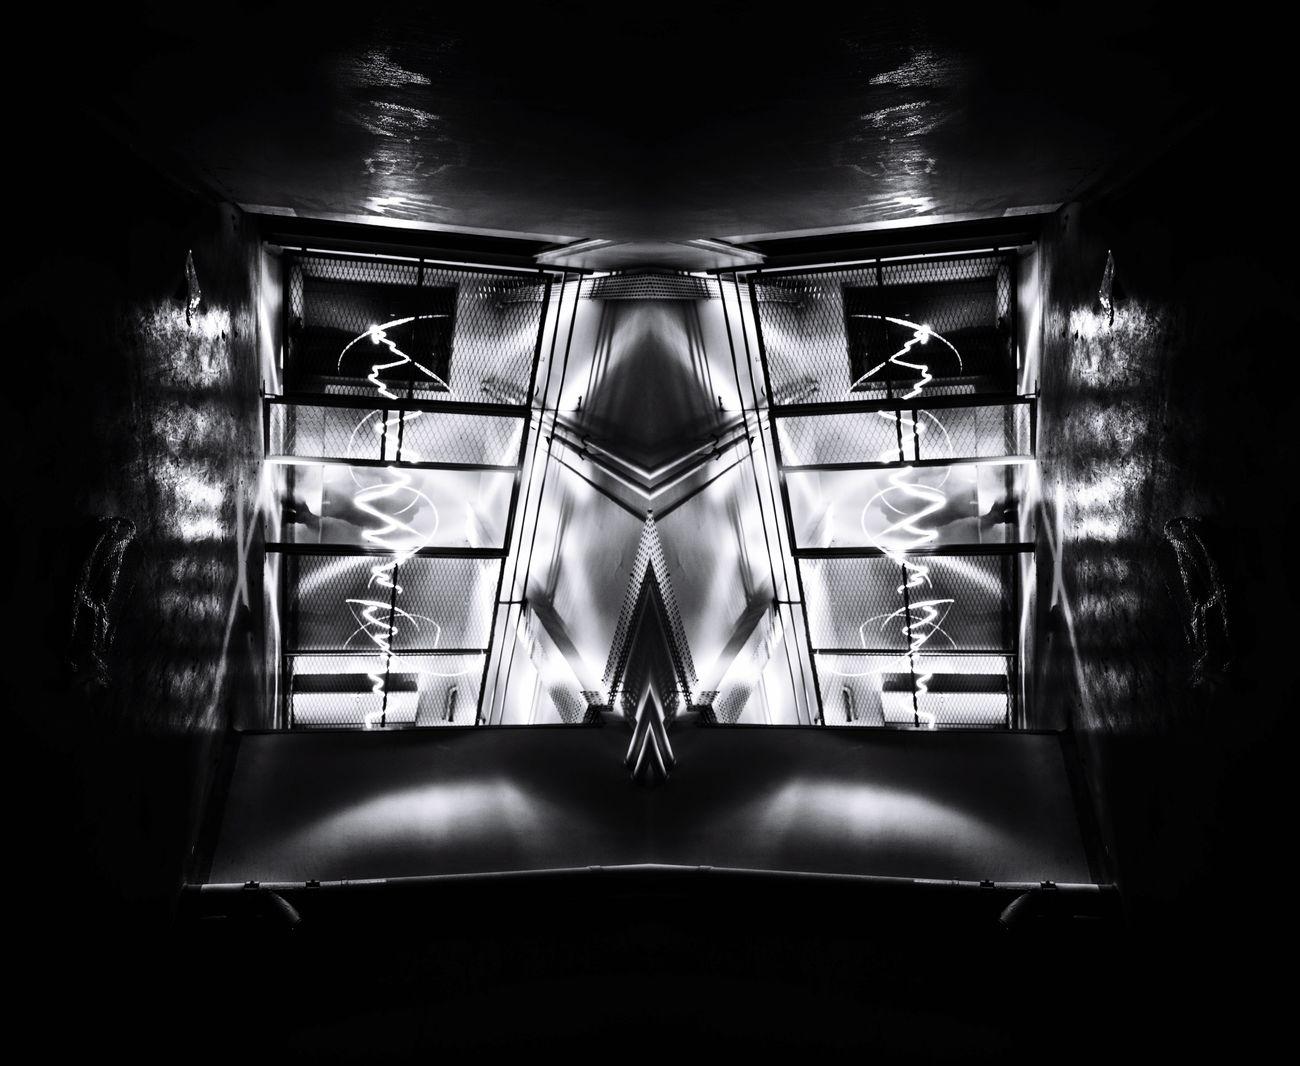 The prisoner Light And Shadow Lightpainting Symmetry Blackandwhite Blackandwhite Photography Symmetrical Urbex Urbexexplorer Exploring Black White Light Dark Darkness And Light Prison Jail Nikon Nikonphotography Wide Shot Sigma10-20 Sigma Photographylovers Photography Pics D7100